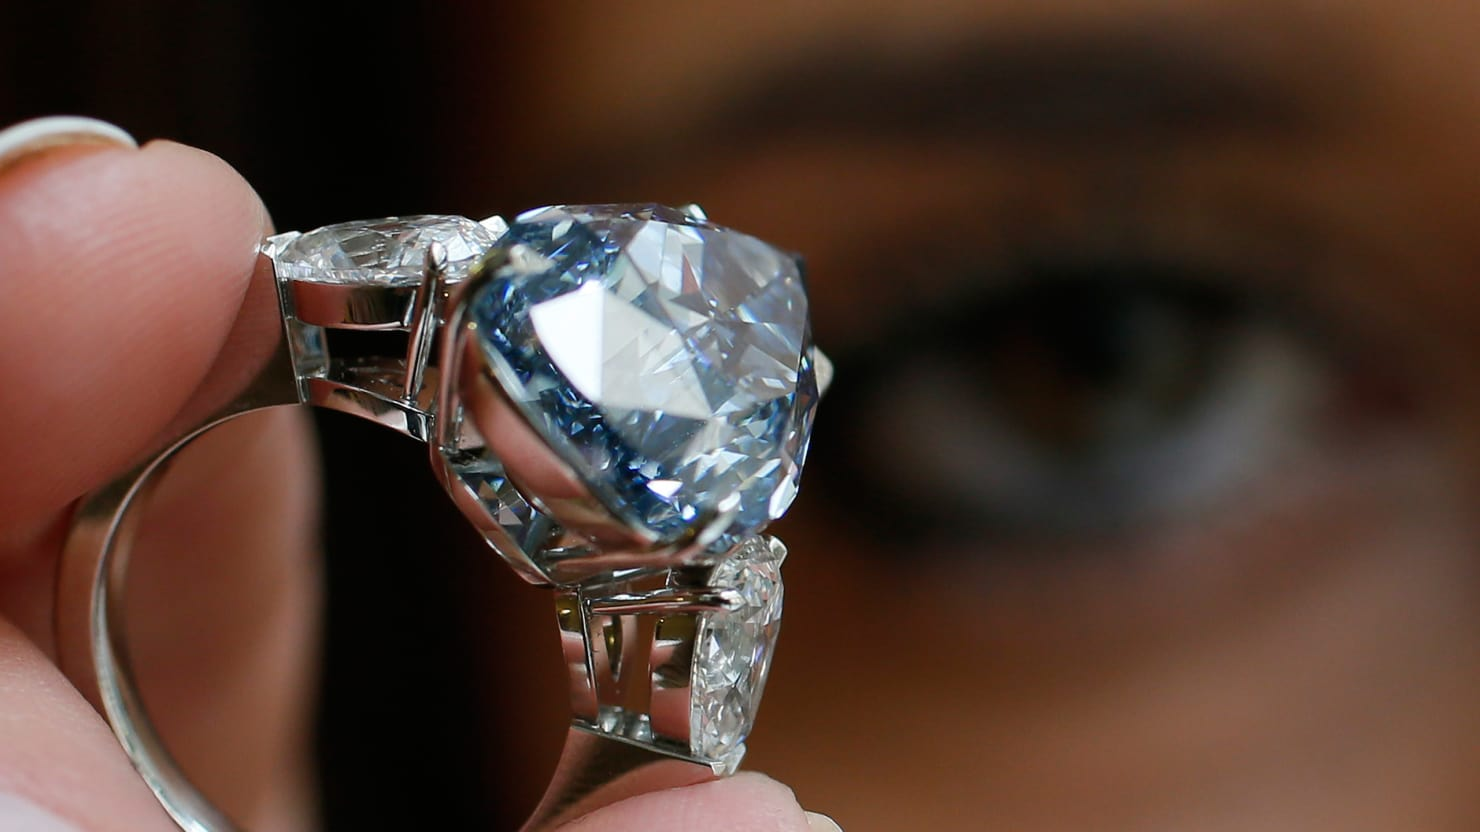 https: img.okezone.com content 2018 05 25 194 1902586 tips-rawat-perhiasan-berlian-biar-tetap-kinclong-qxsJZnw0He.jpg